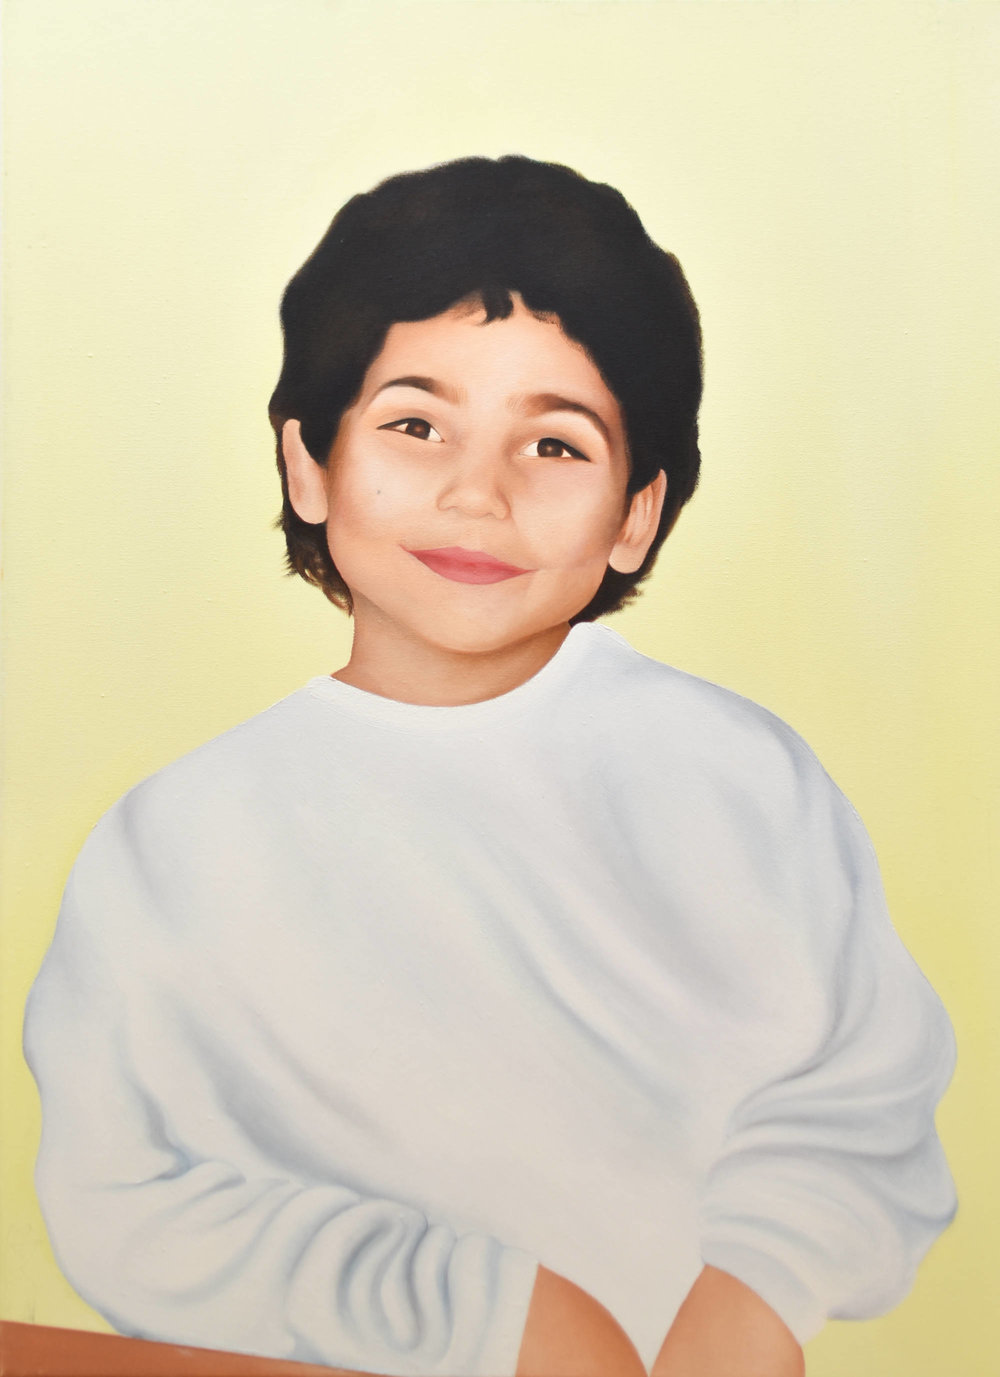 Honouring my inner child